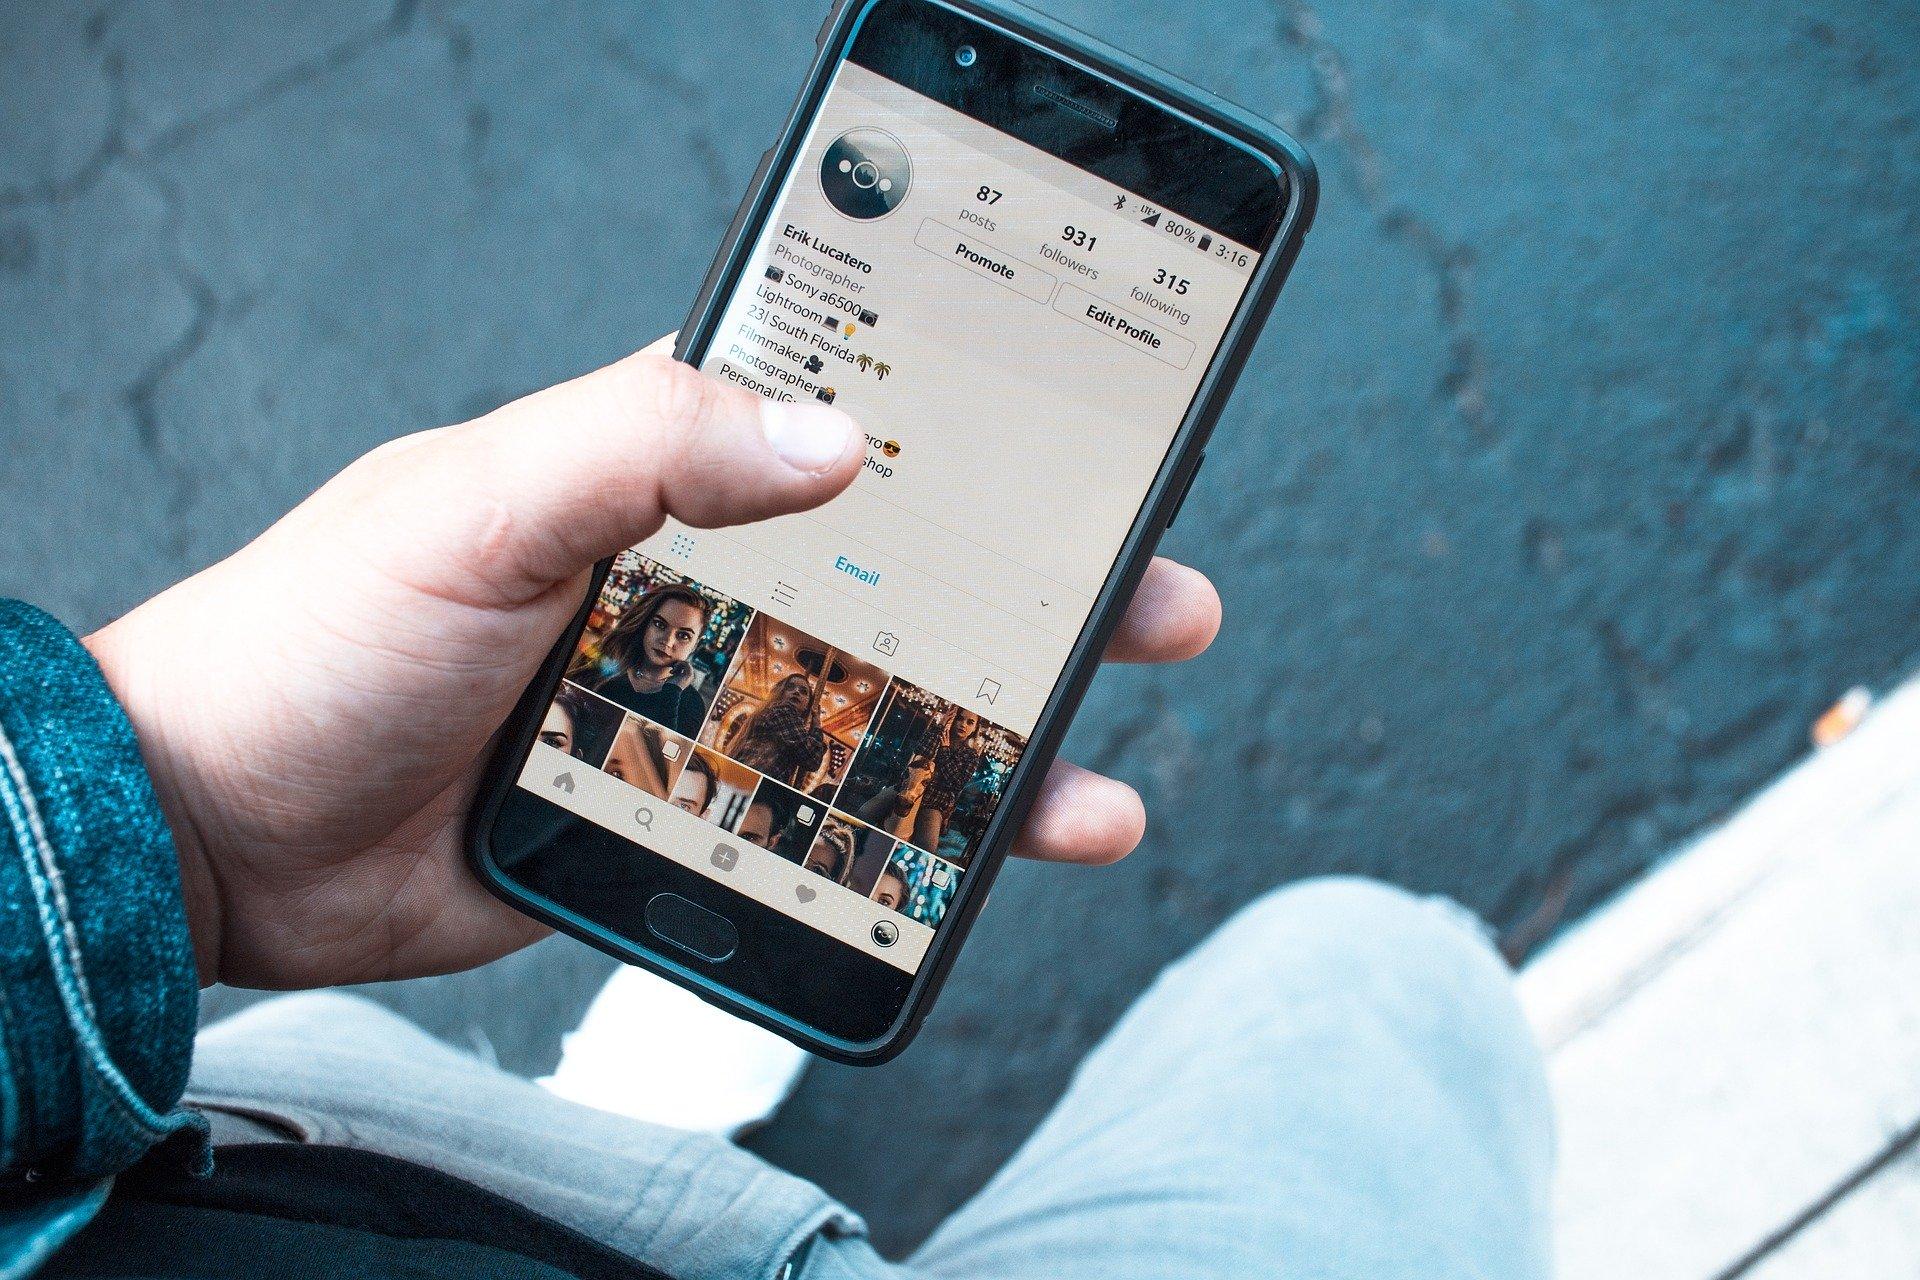 social media, texting